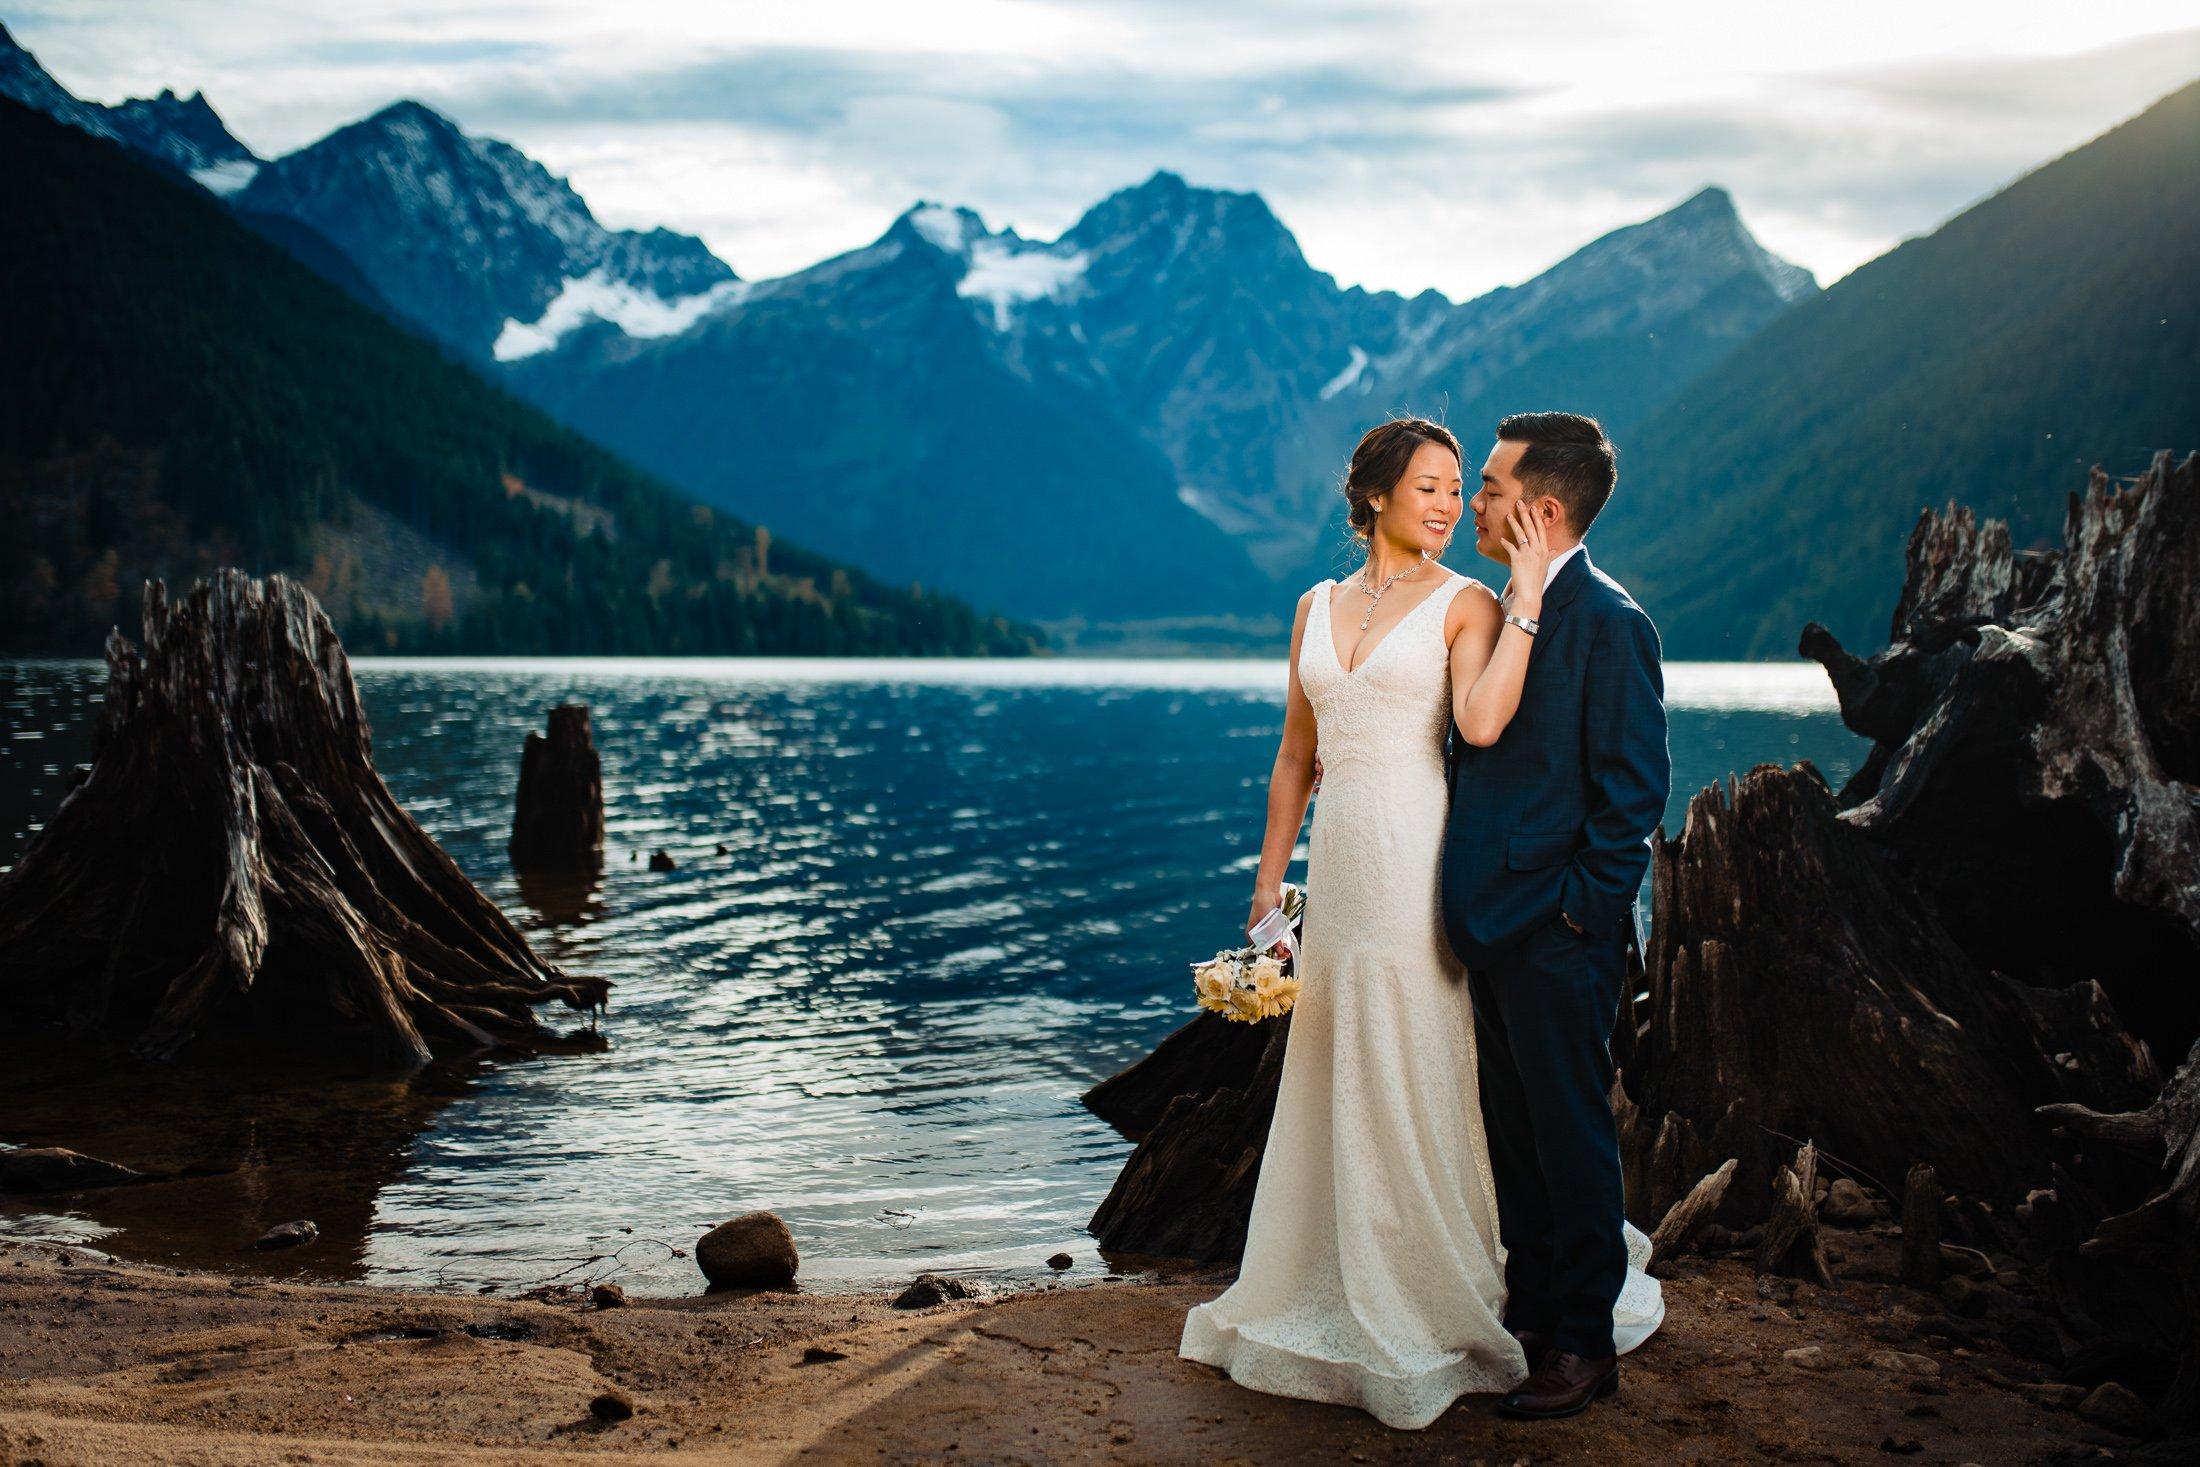 014 - lower mainland adventure mountain elopement